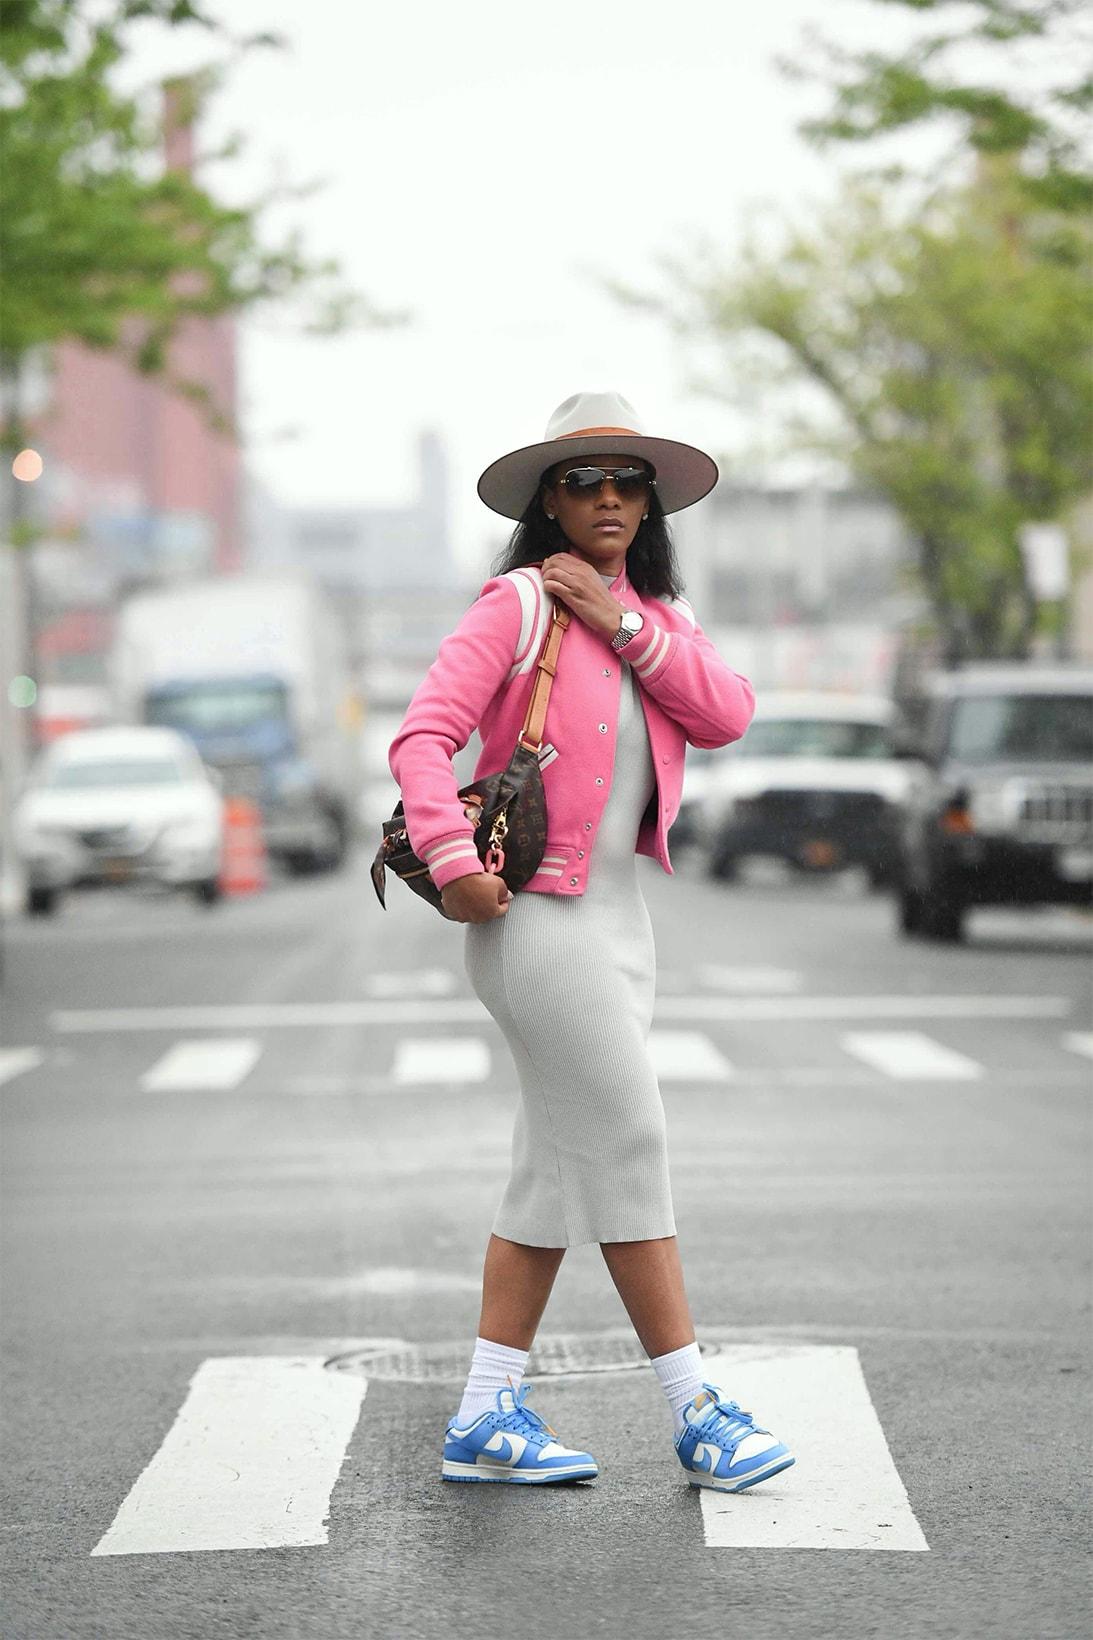 shaniqua j sneaker collector content creator wardrobe stylist influencer fashion kicks footwear nike air jordan 1